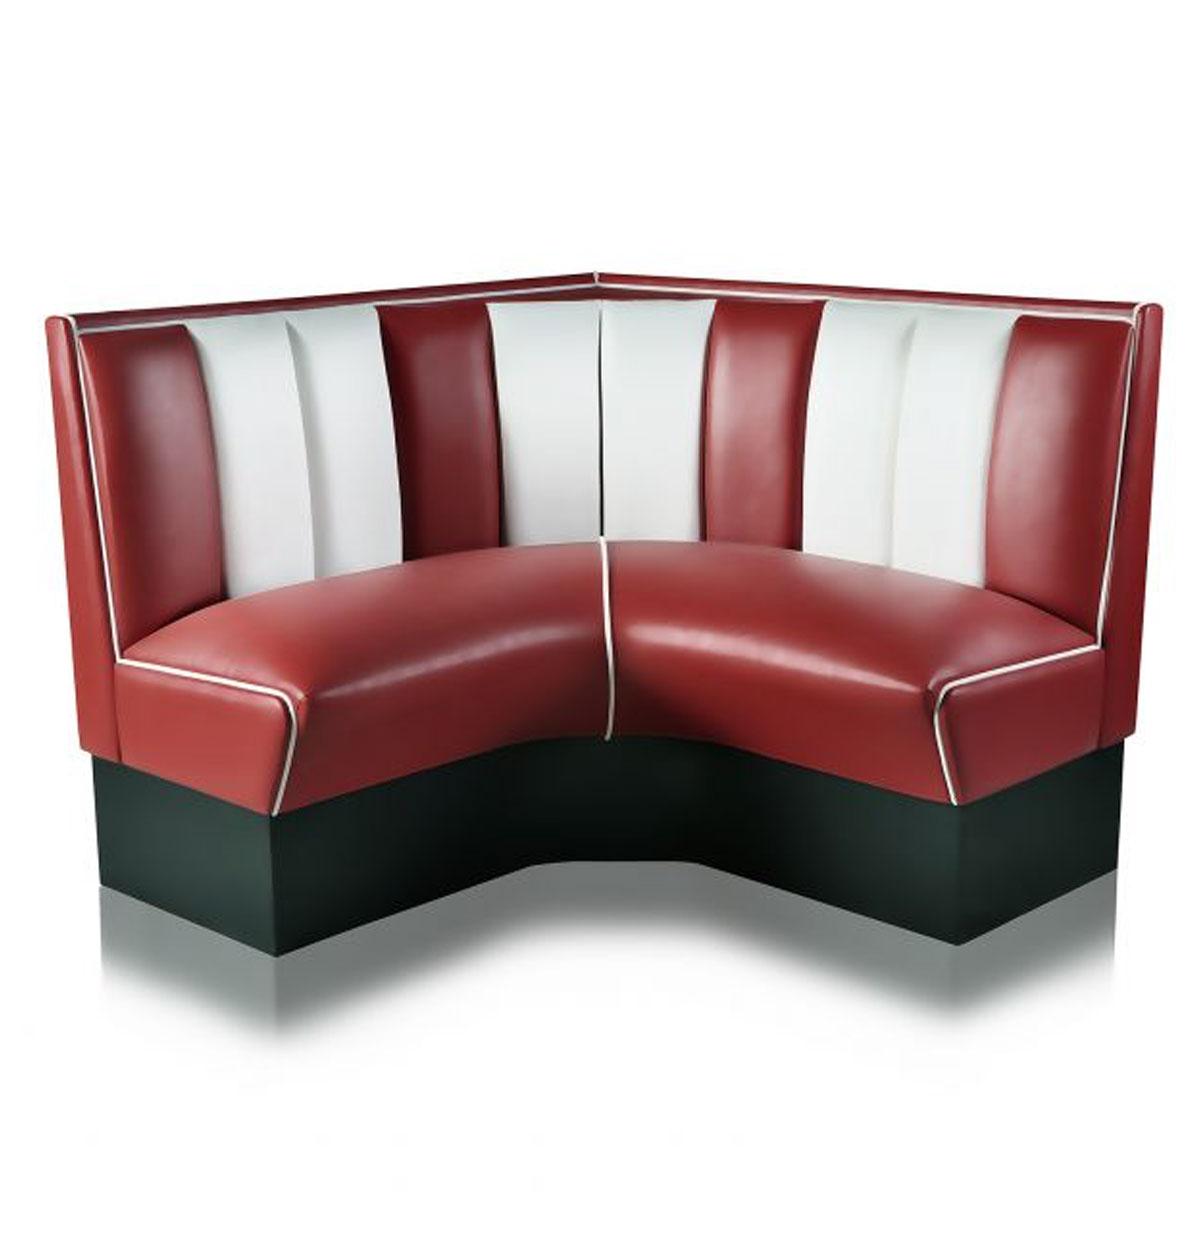 Kwart cirkel Diner Bank 120 cm Ruby/Wit